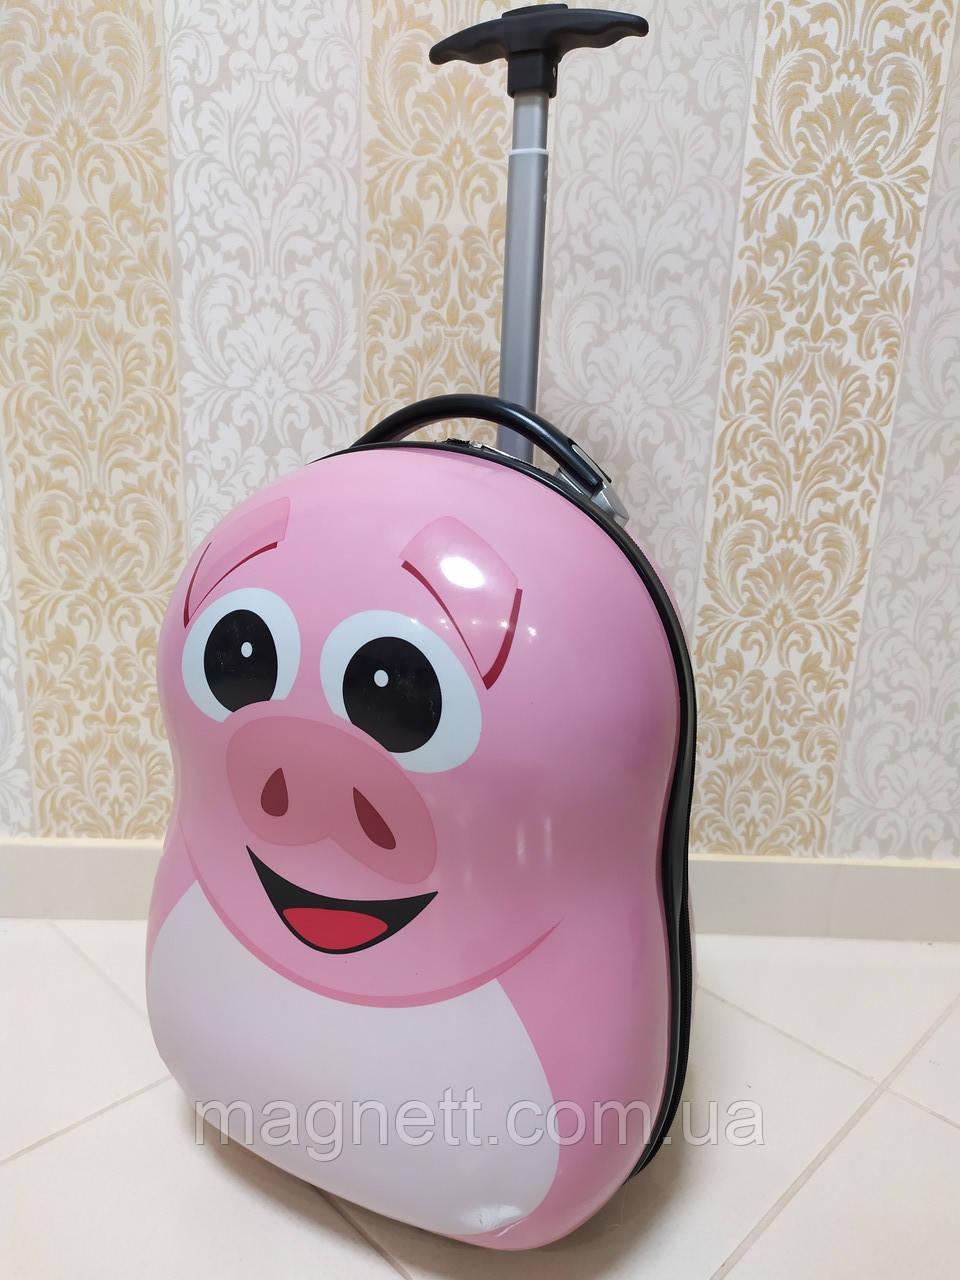 Дитяча валіза на 2 колесах 45*30*25см Рожева Свинка